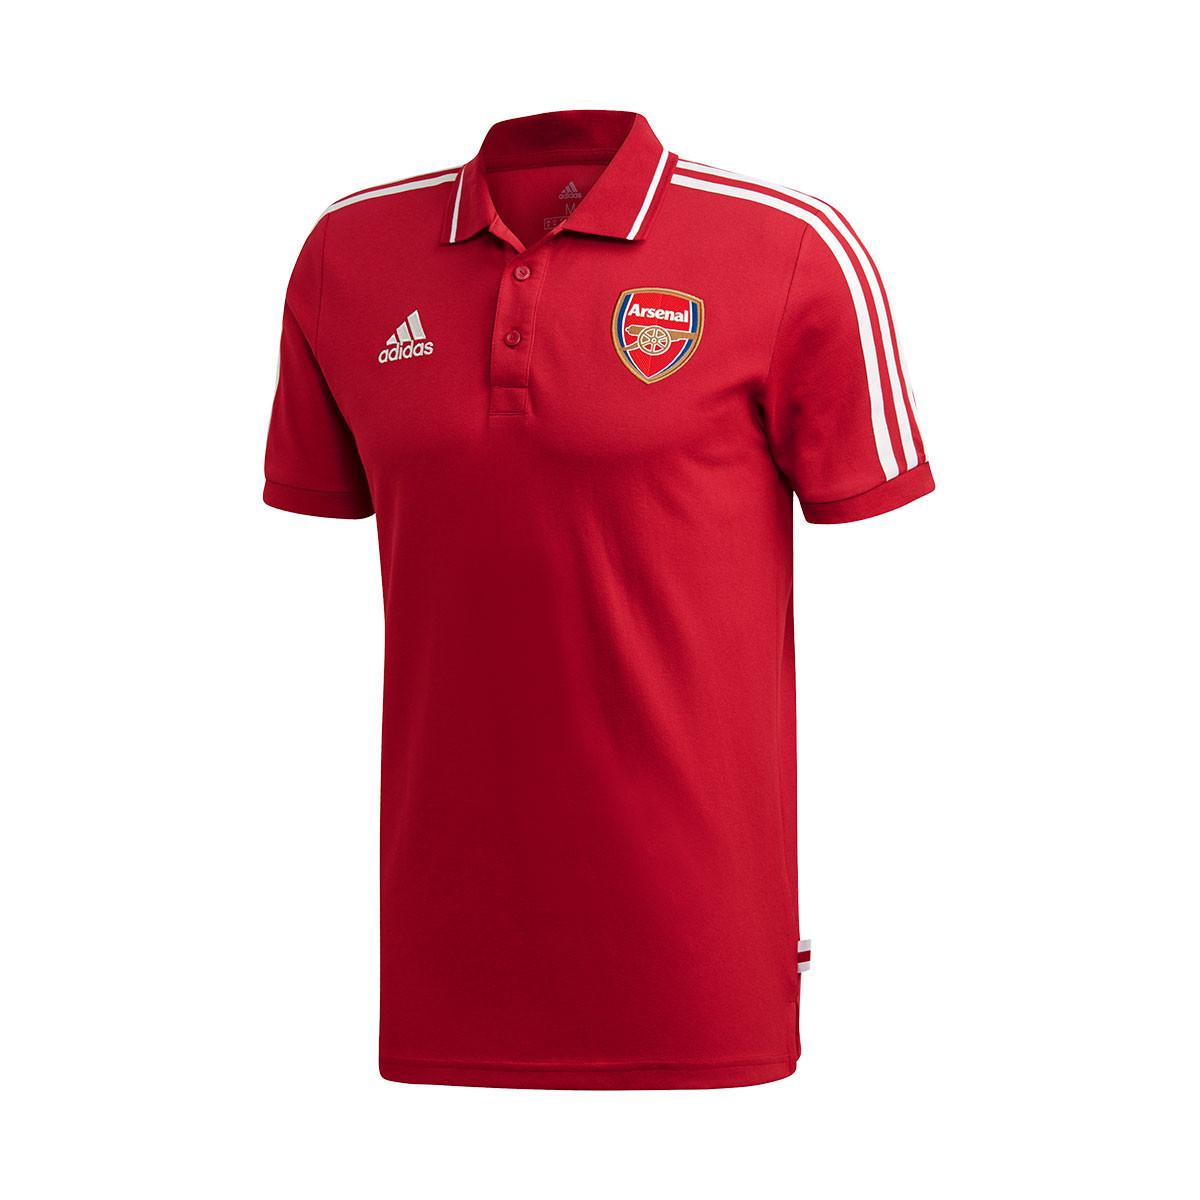 Picotear mudo lo mismo  Polo shirt adidas Arsenal FC 2019-2020 Active maroon - Football store  Fútbol Emotion